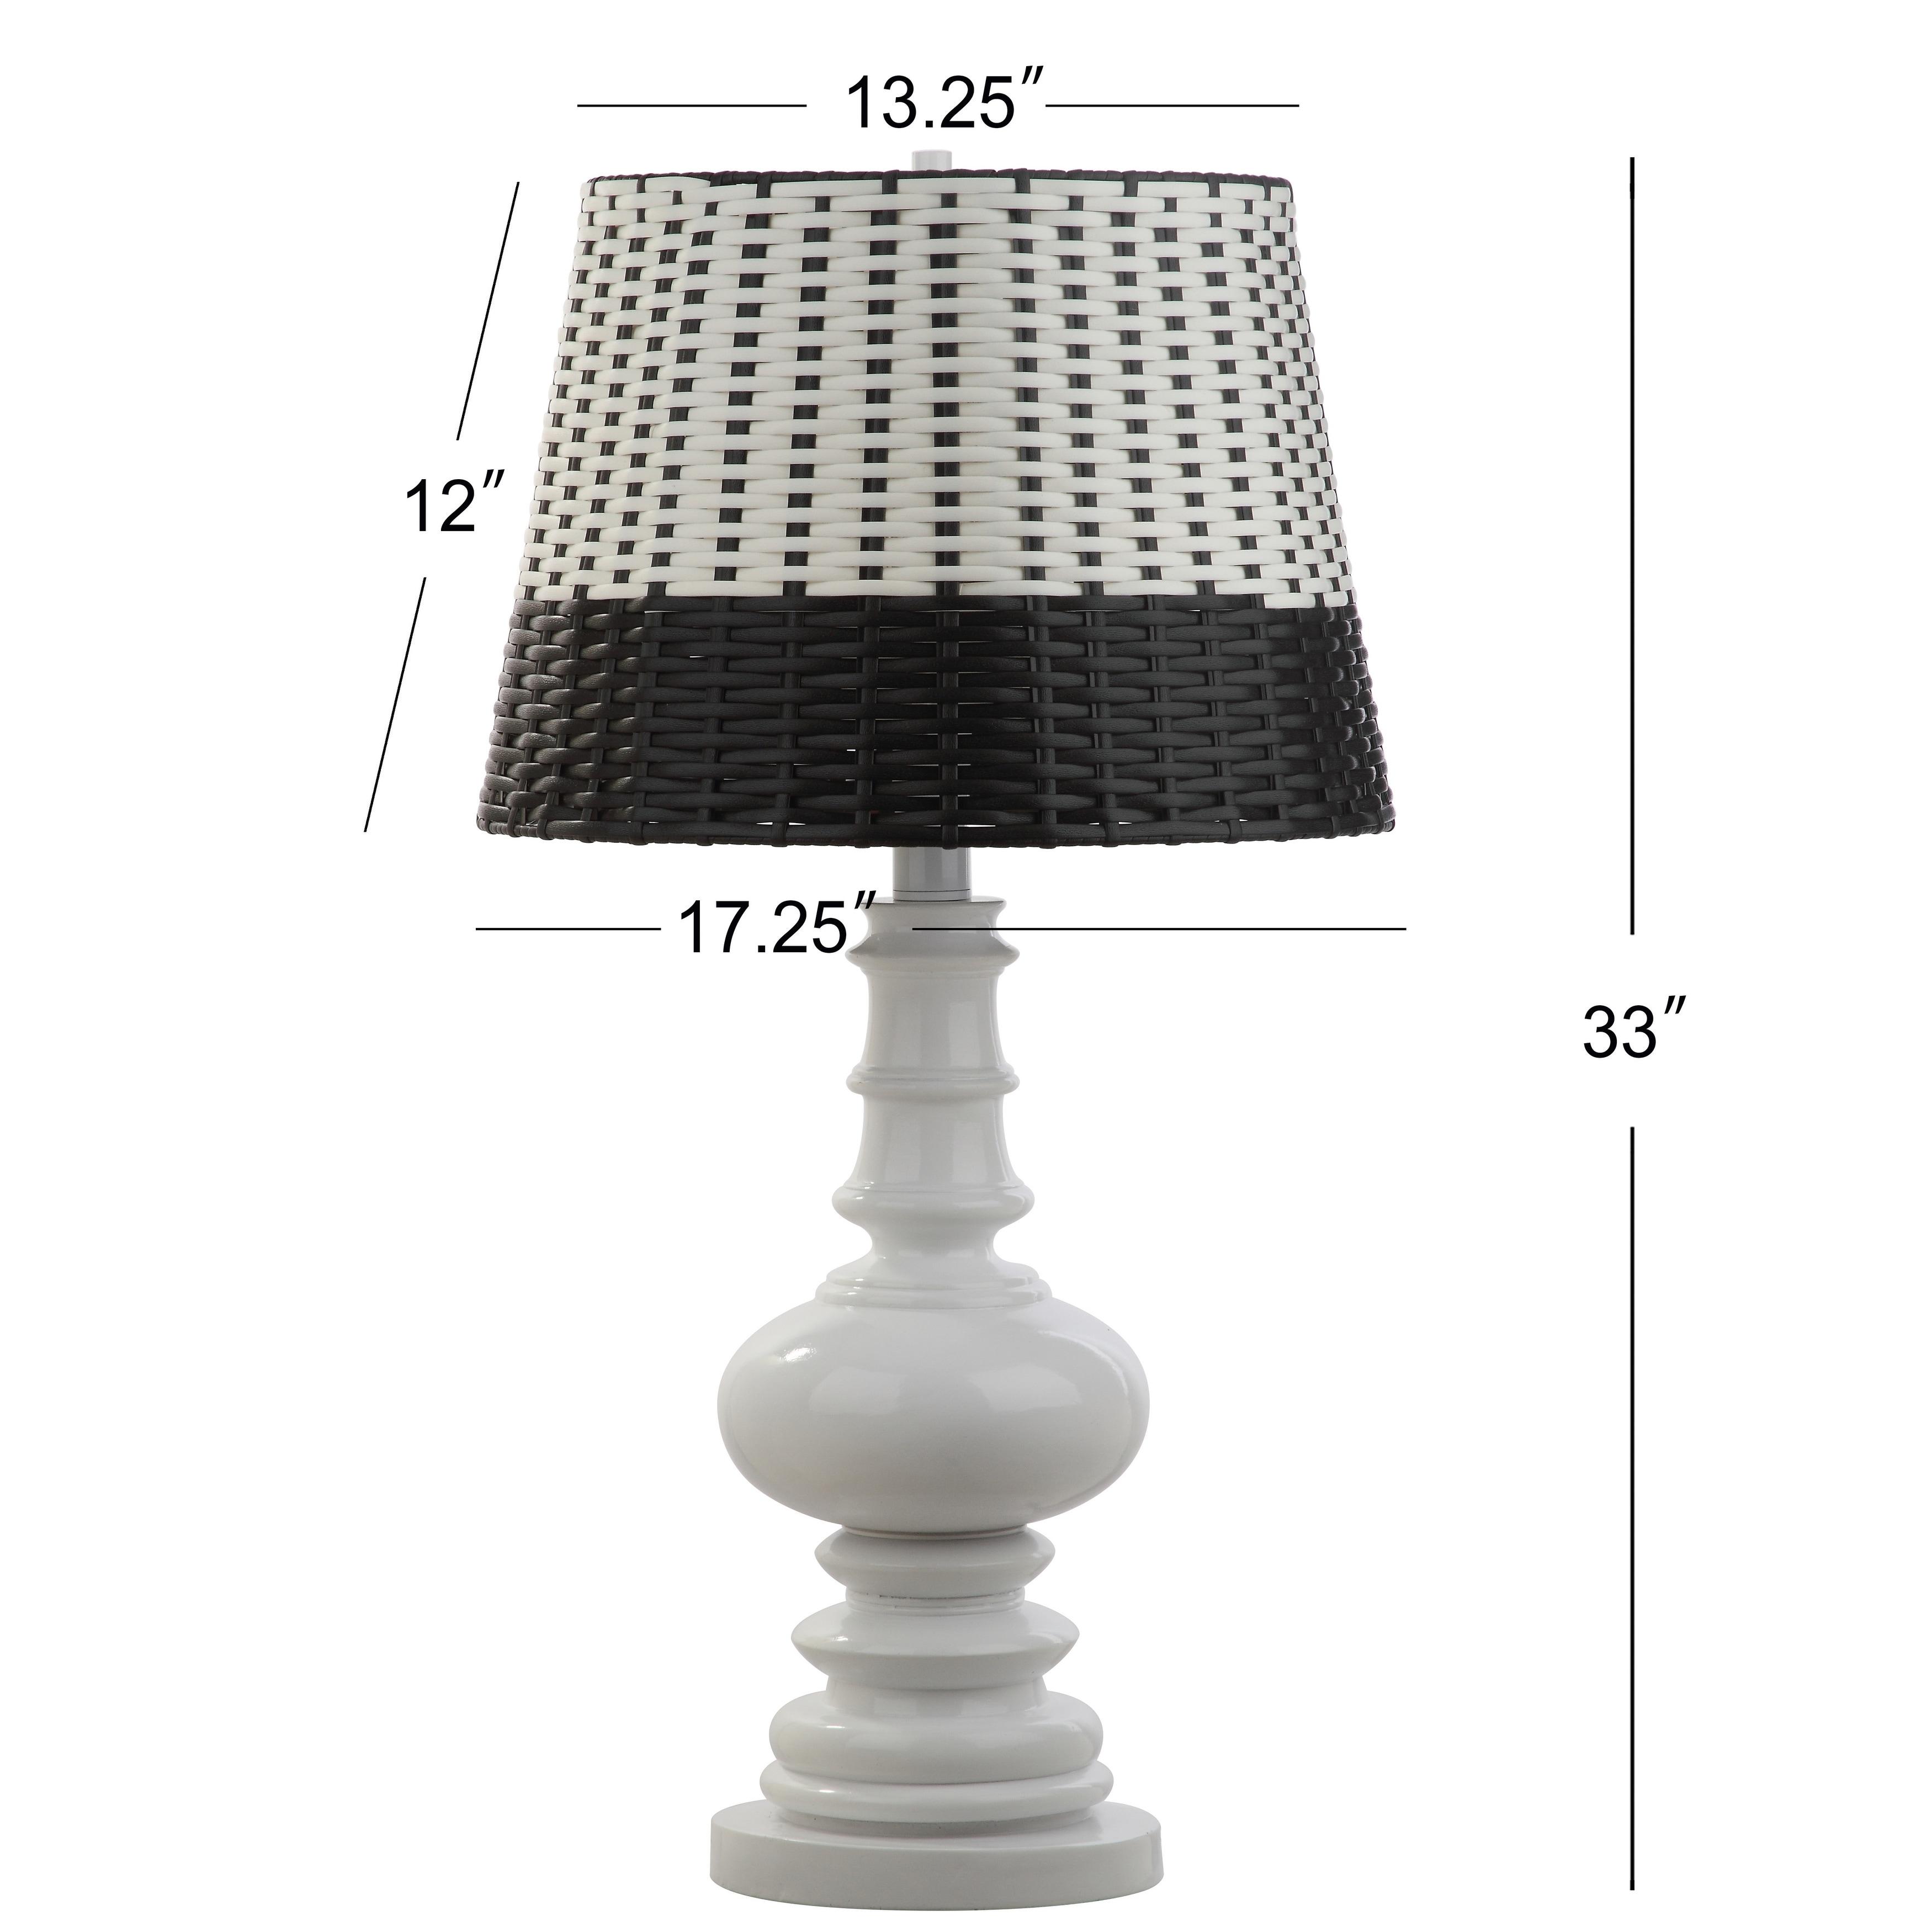 Safavieh Lighting 33 Inch Macen Woven Led Table Lamp 17 25 X17 25 X33 On Sale Overstock 19467423